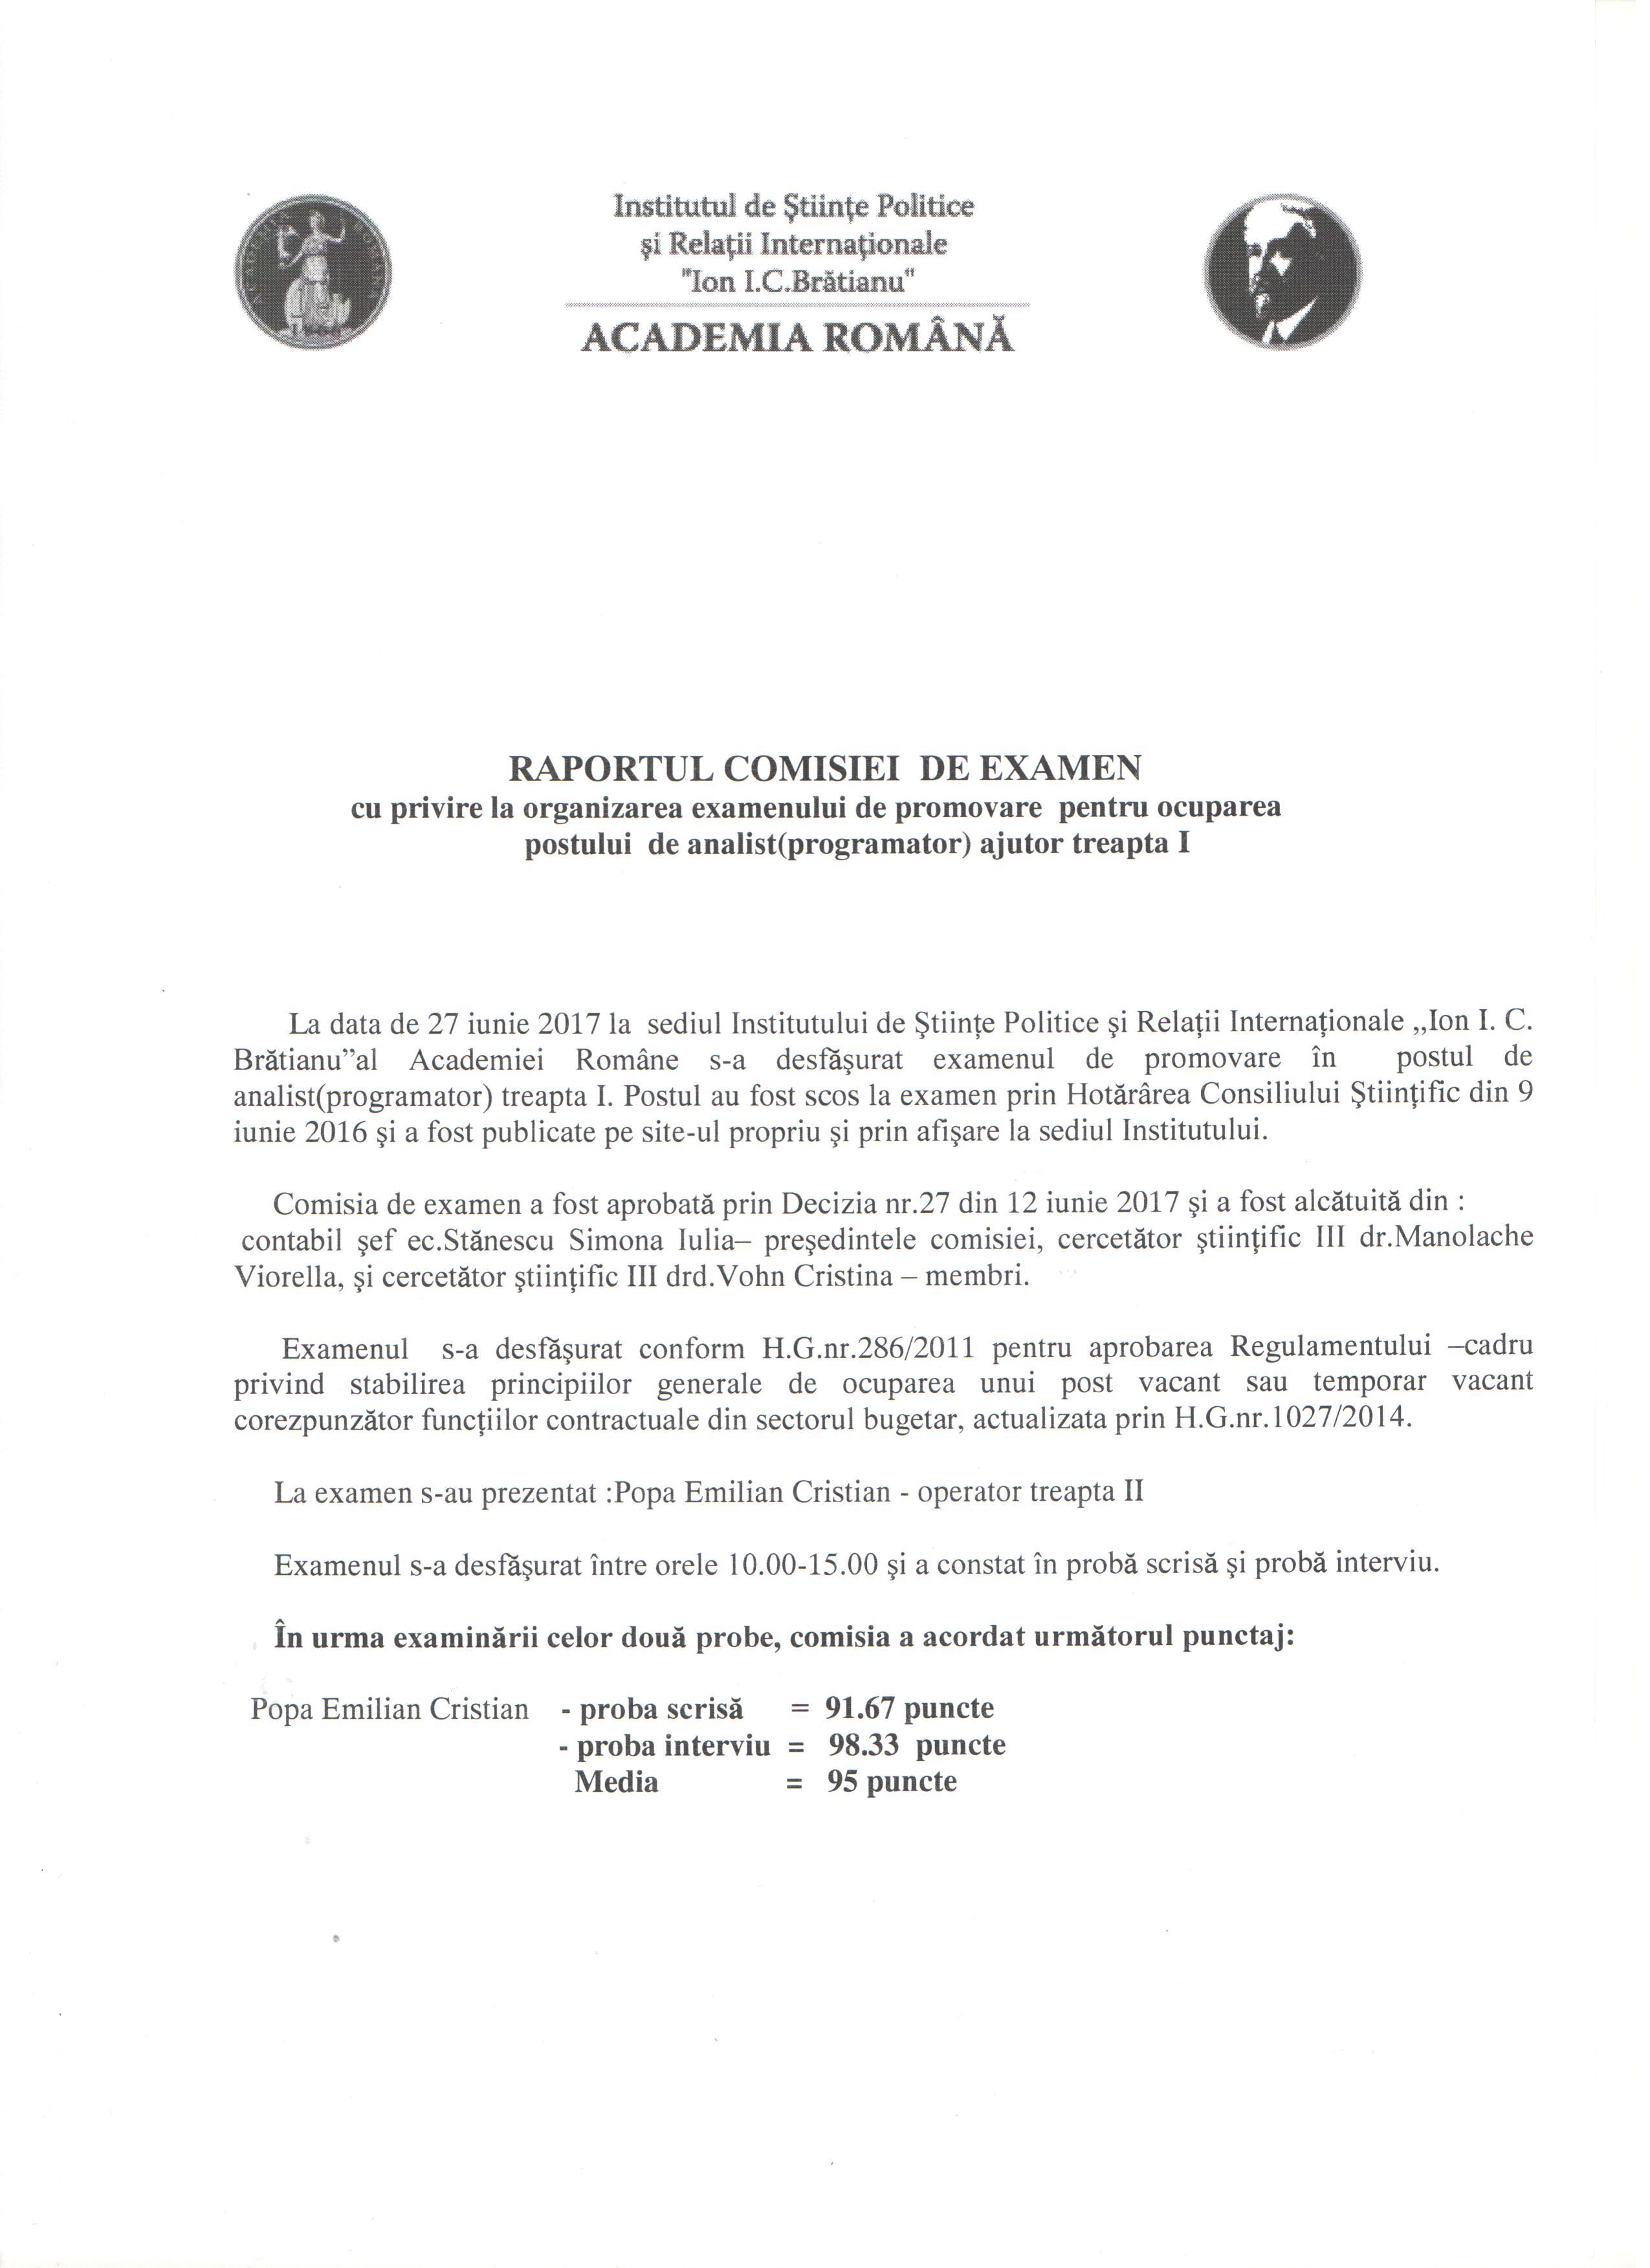 Rez.ex. de promovare pt. posturile analist progr.ajut.tr I